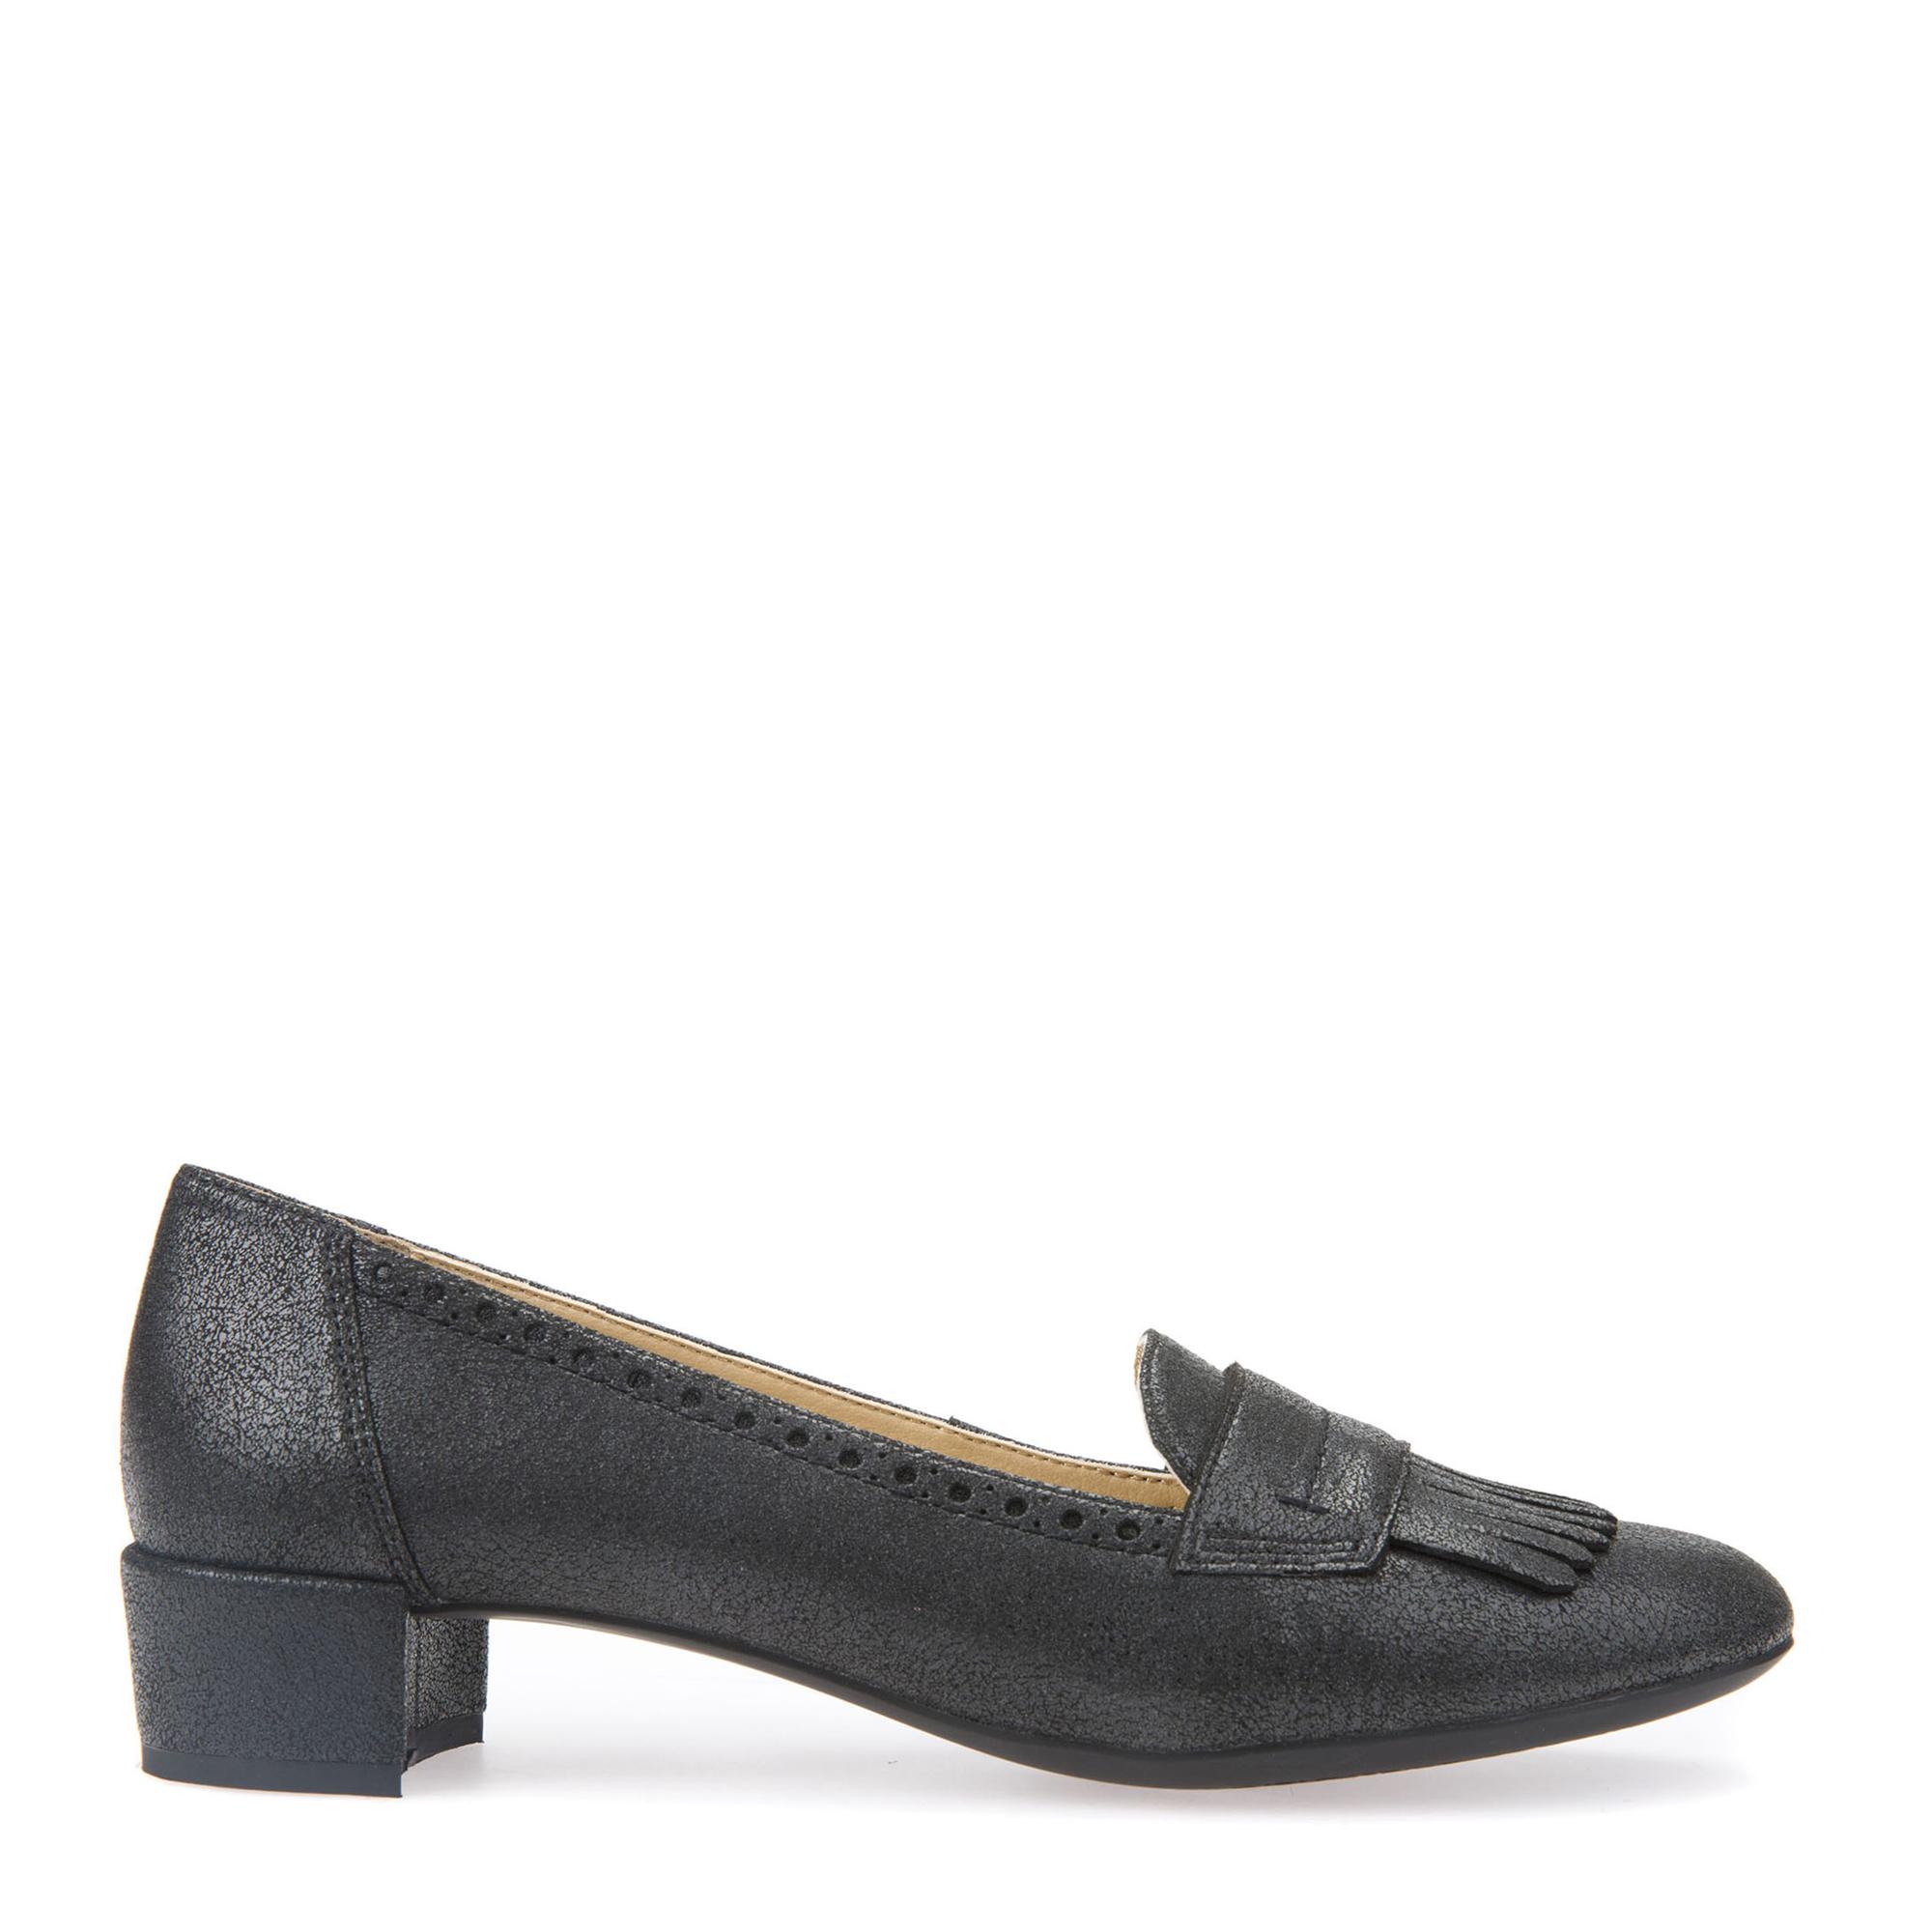 Geox thymar slip ons light taupe women sale shoes flats